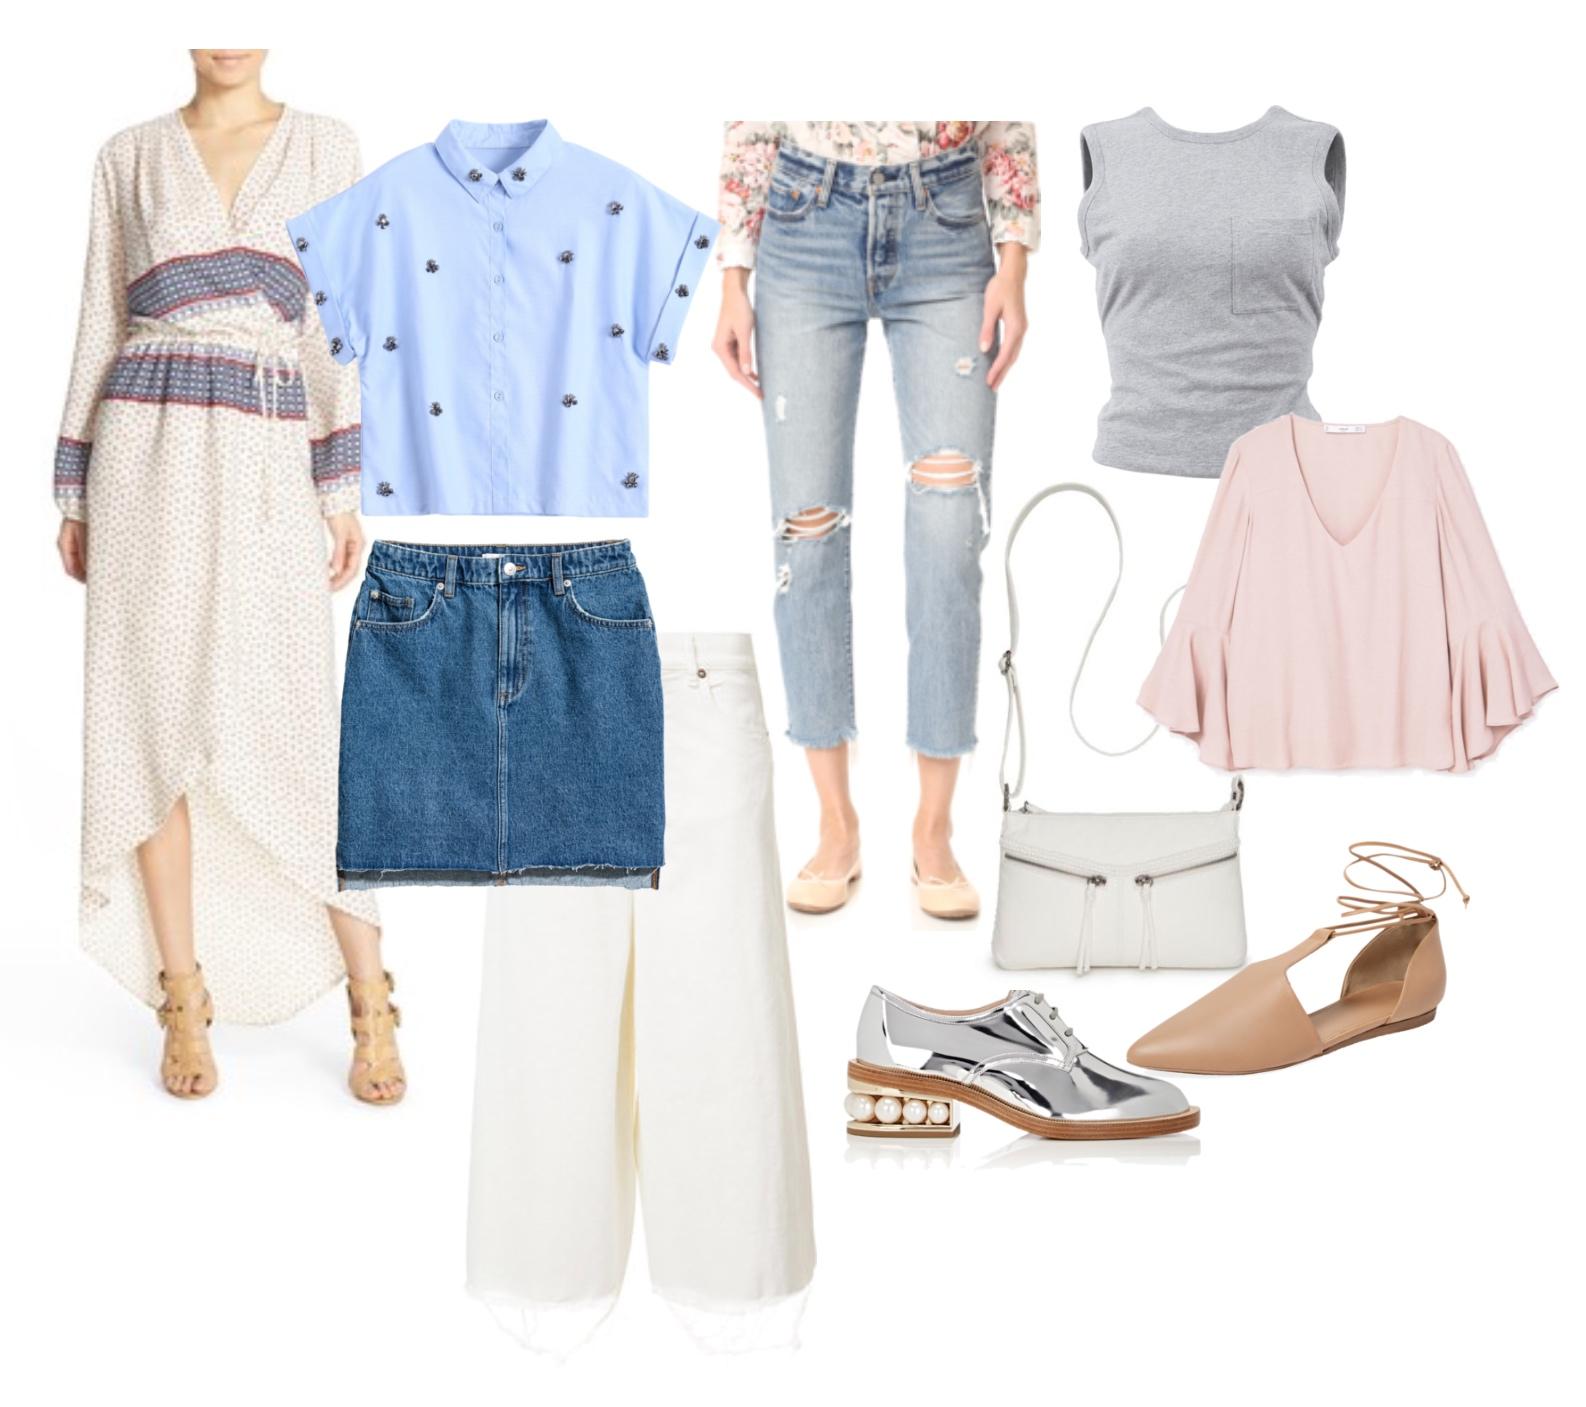 Spring/summer 17 capsule wardrobe